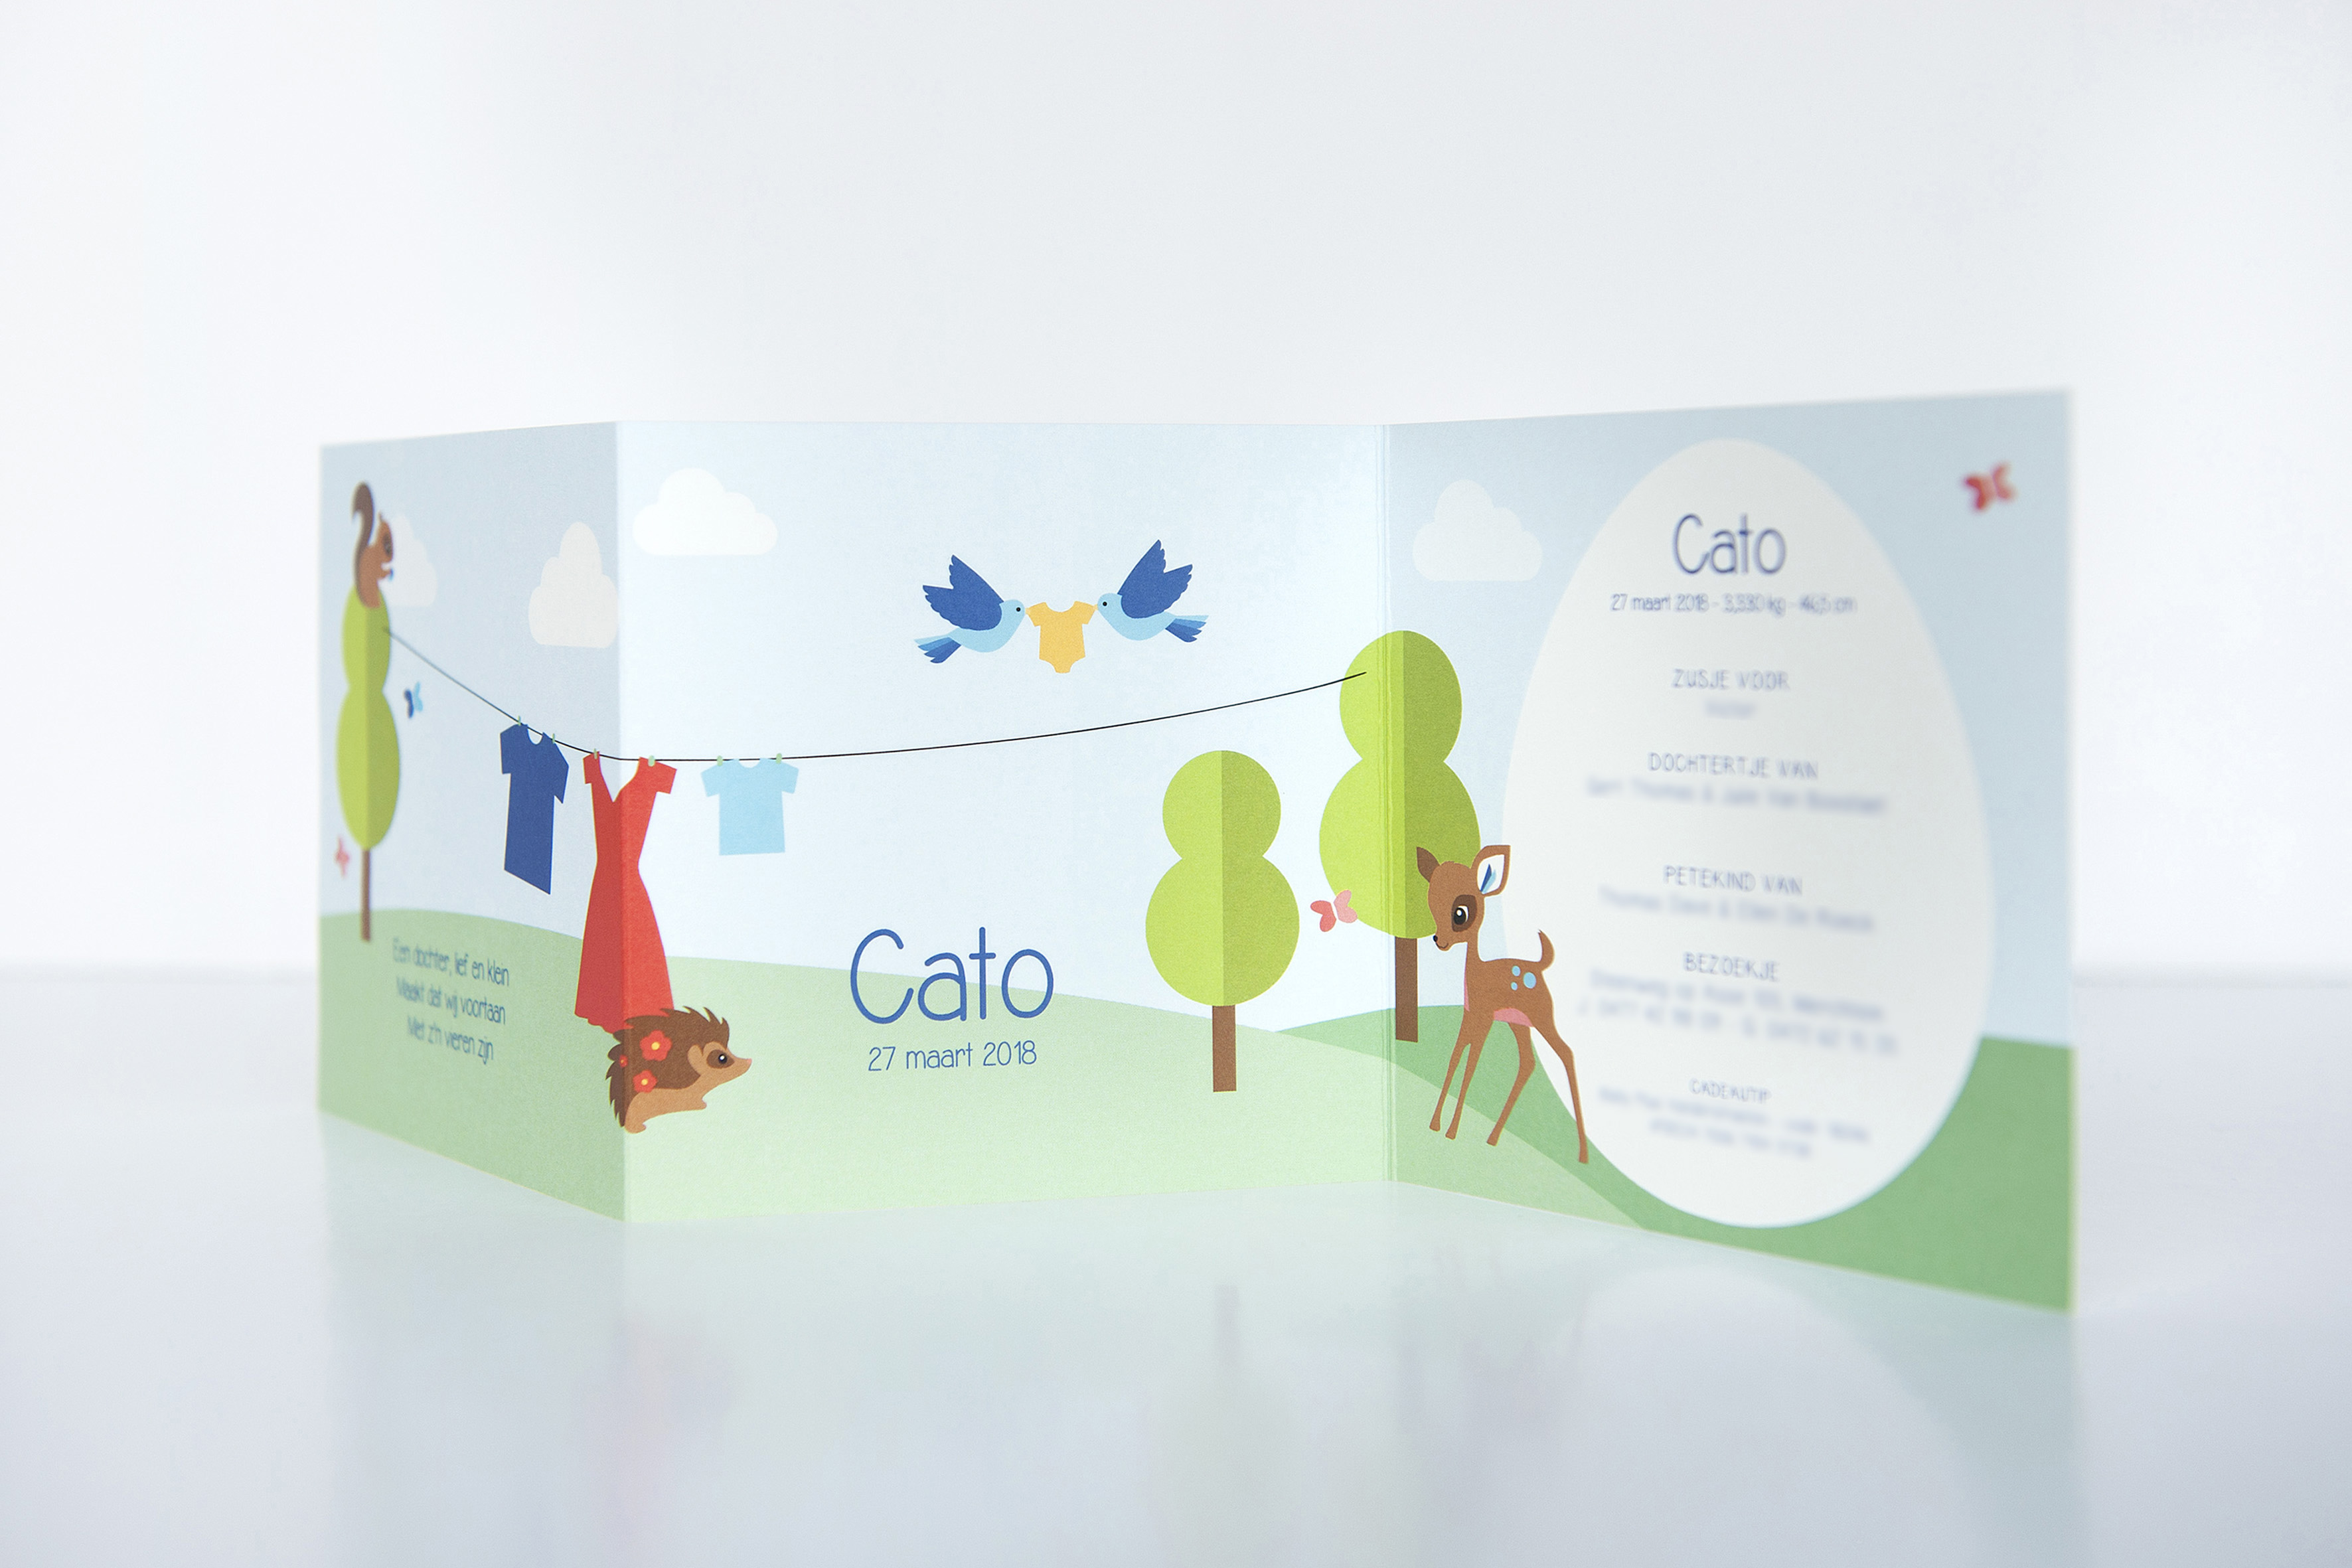 Cato006